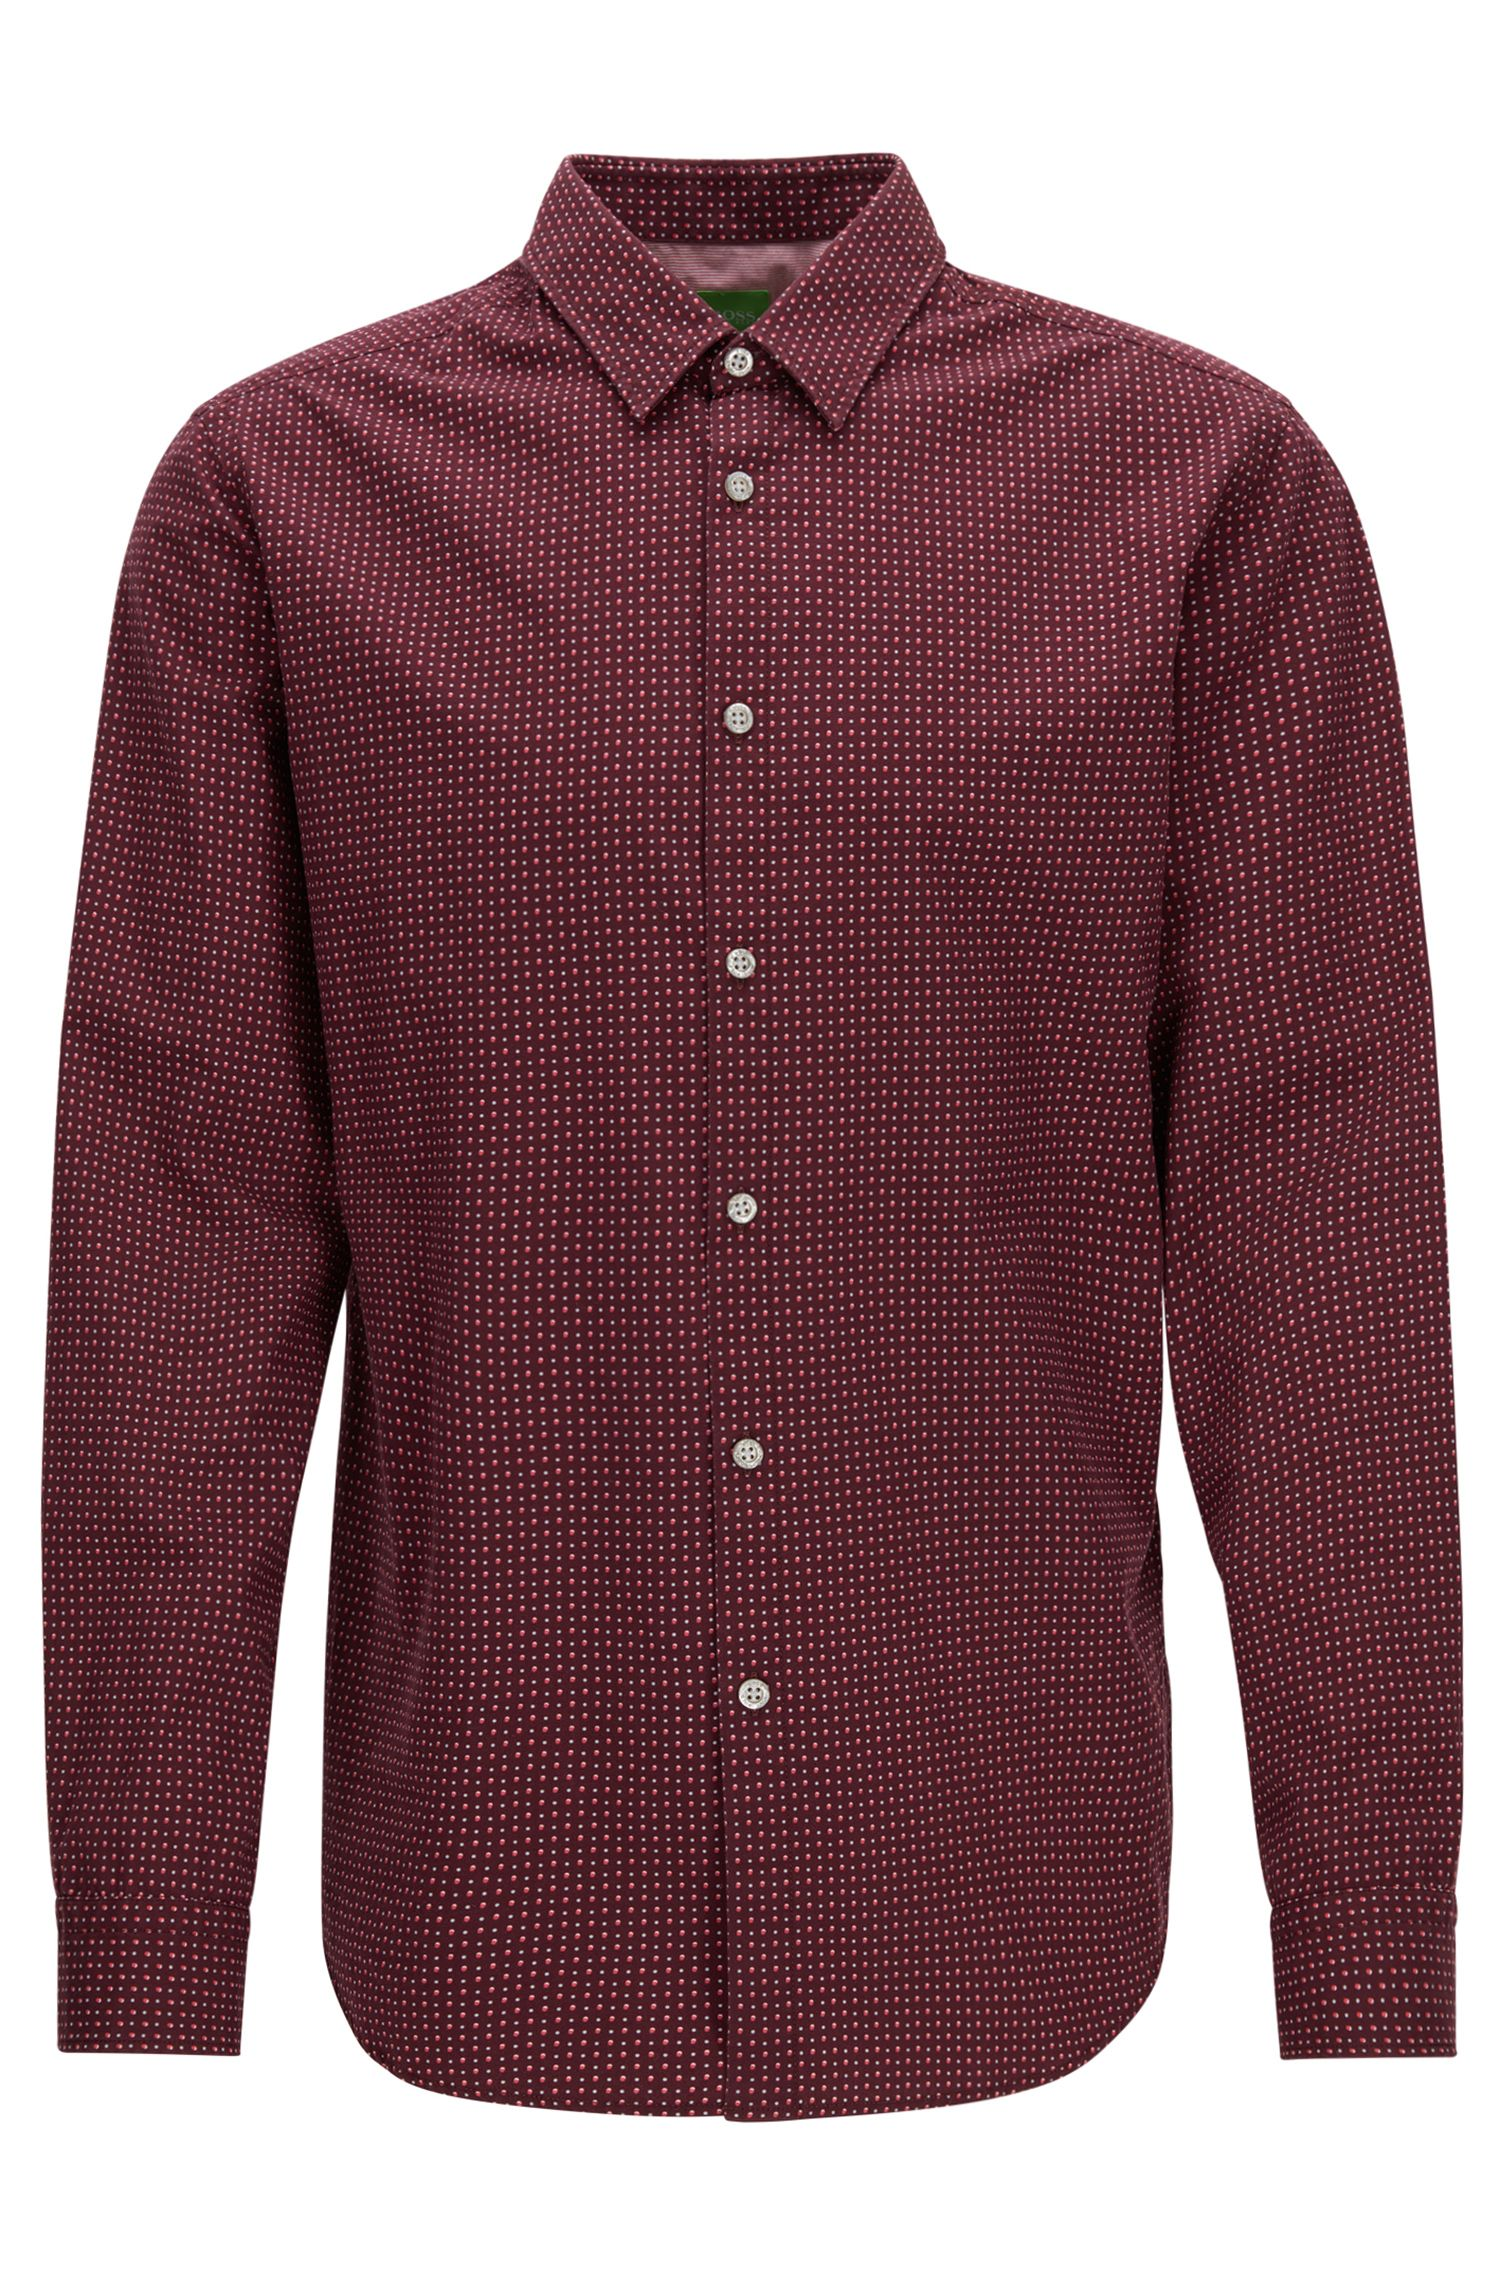 'C-Bustai R' | Regular Fit, Cotton Button Down Shirt